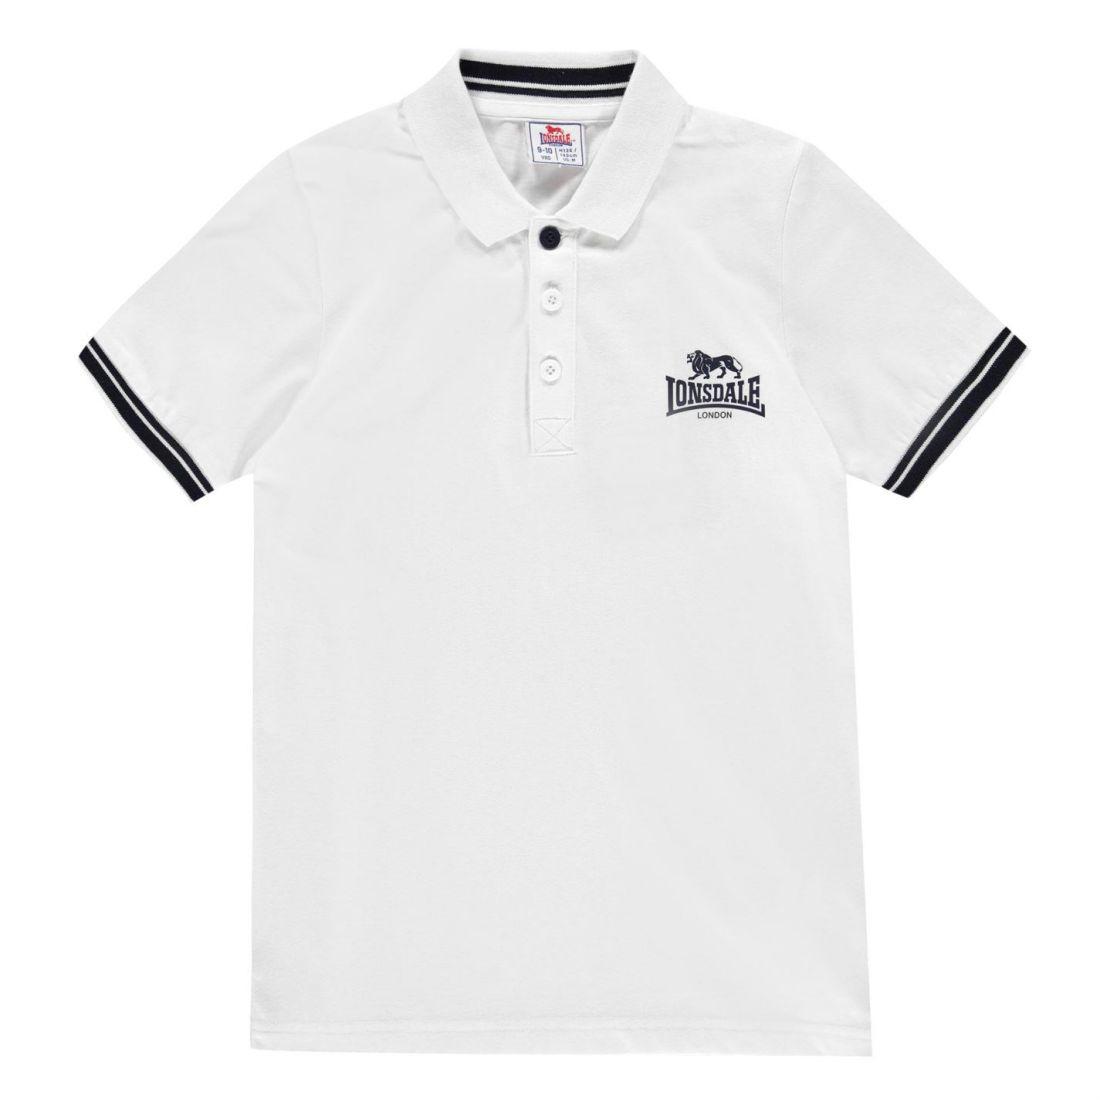 e8a88c6f6 Lonsdale Kids Boys 2 Stripe Jersey Polo Junior Shirt Classic Fit Tee ...